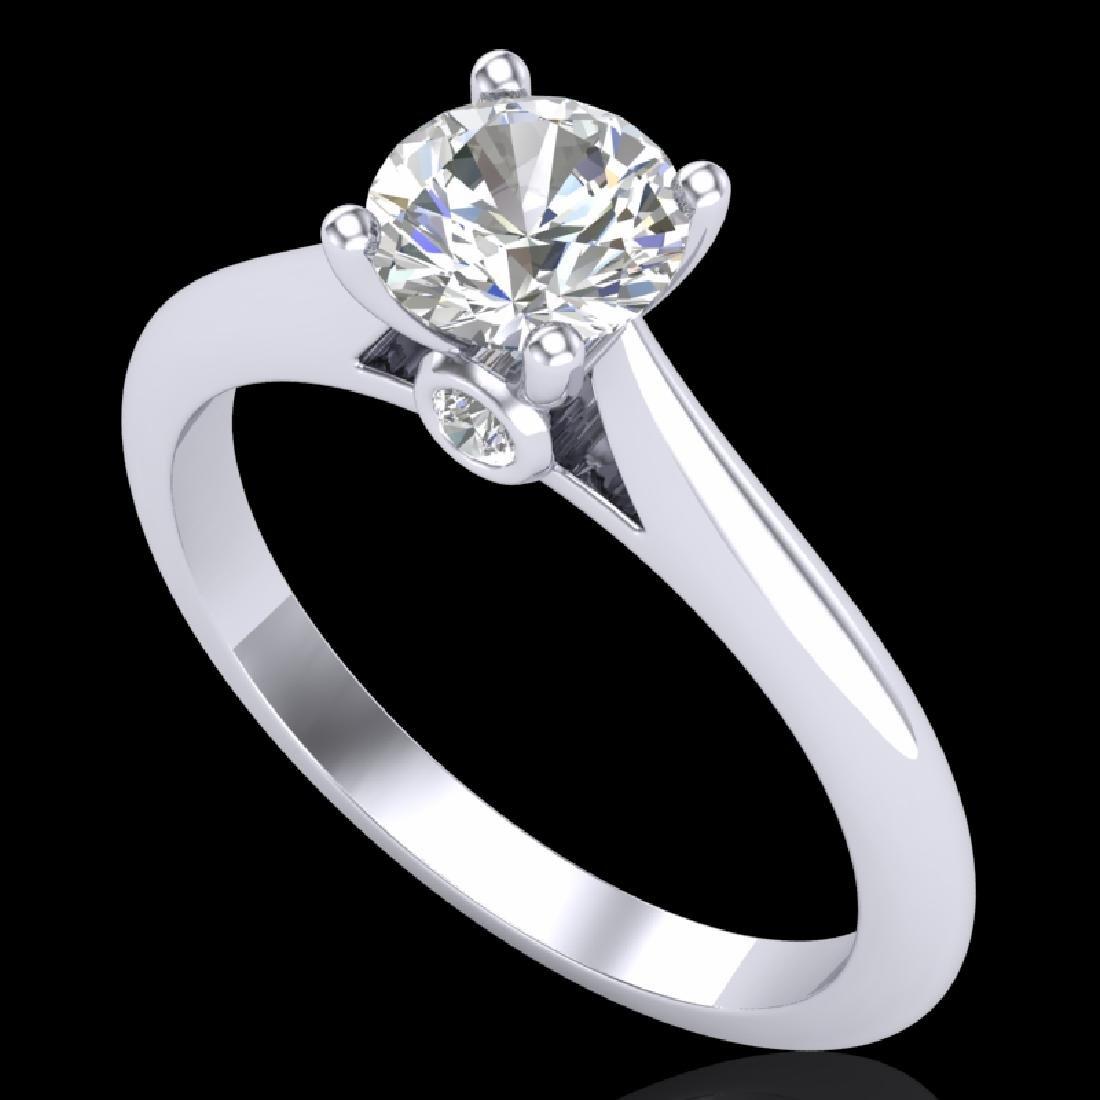 0.83 CTW VS/SI Diamond Solitaire Art Deco Ring 18K